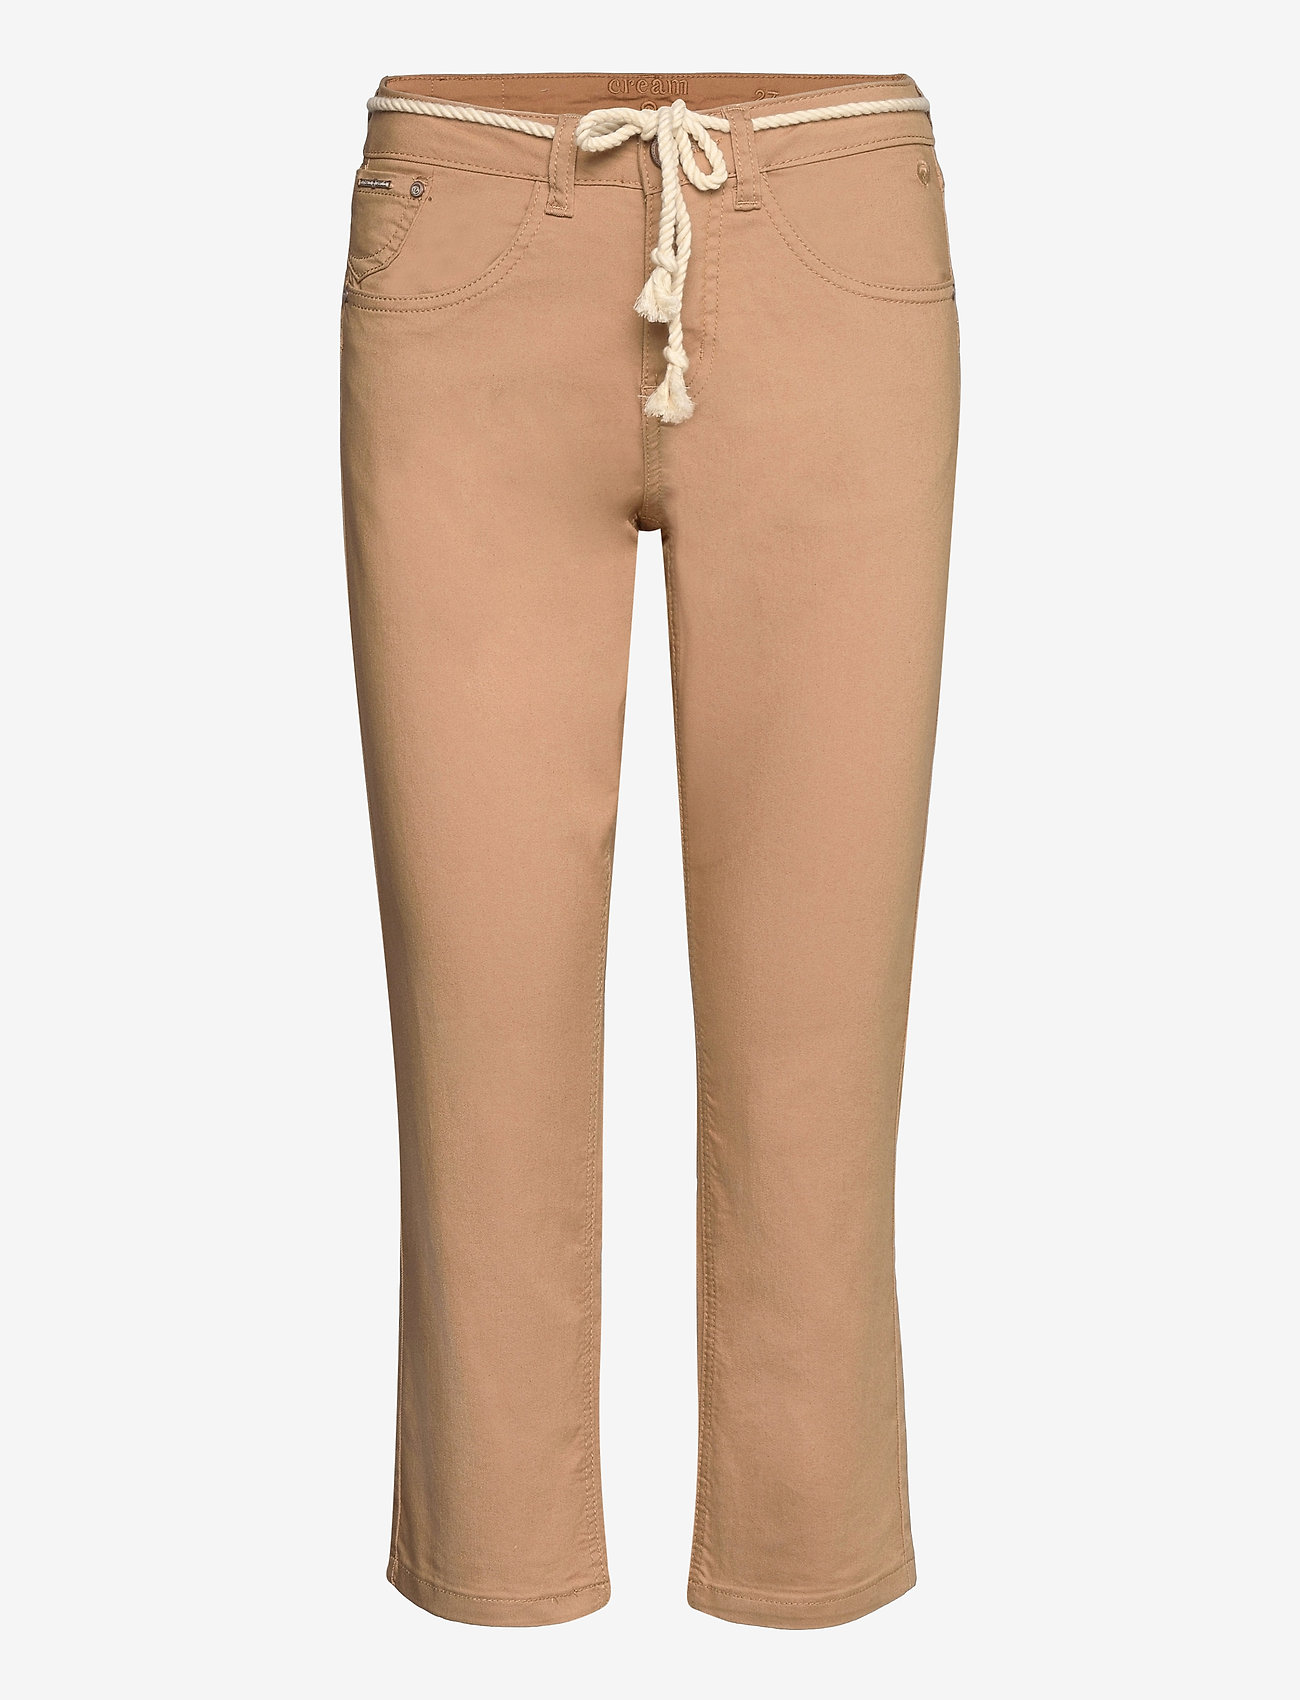 Cream - CRVava Pant 3/4 - Coco Fit - straight regular - tannin - 0